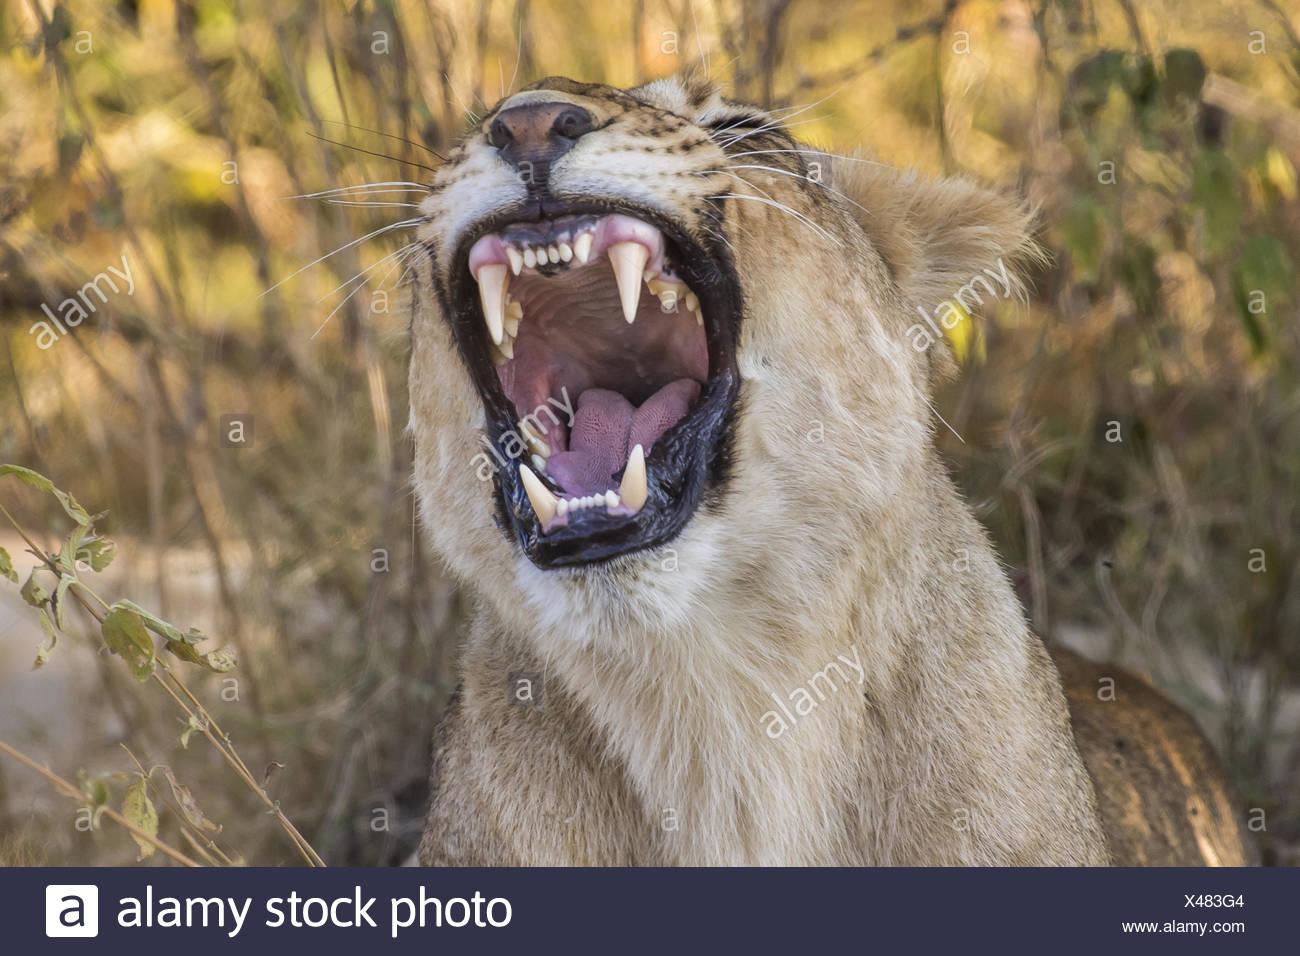 Lion, (Panthera leo) yawning - Stock Image